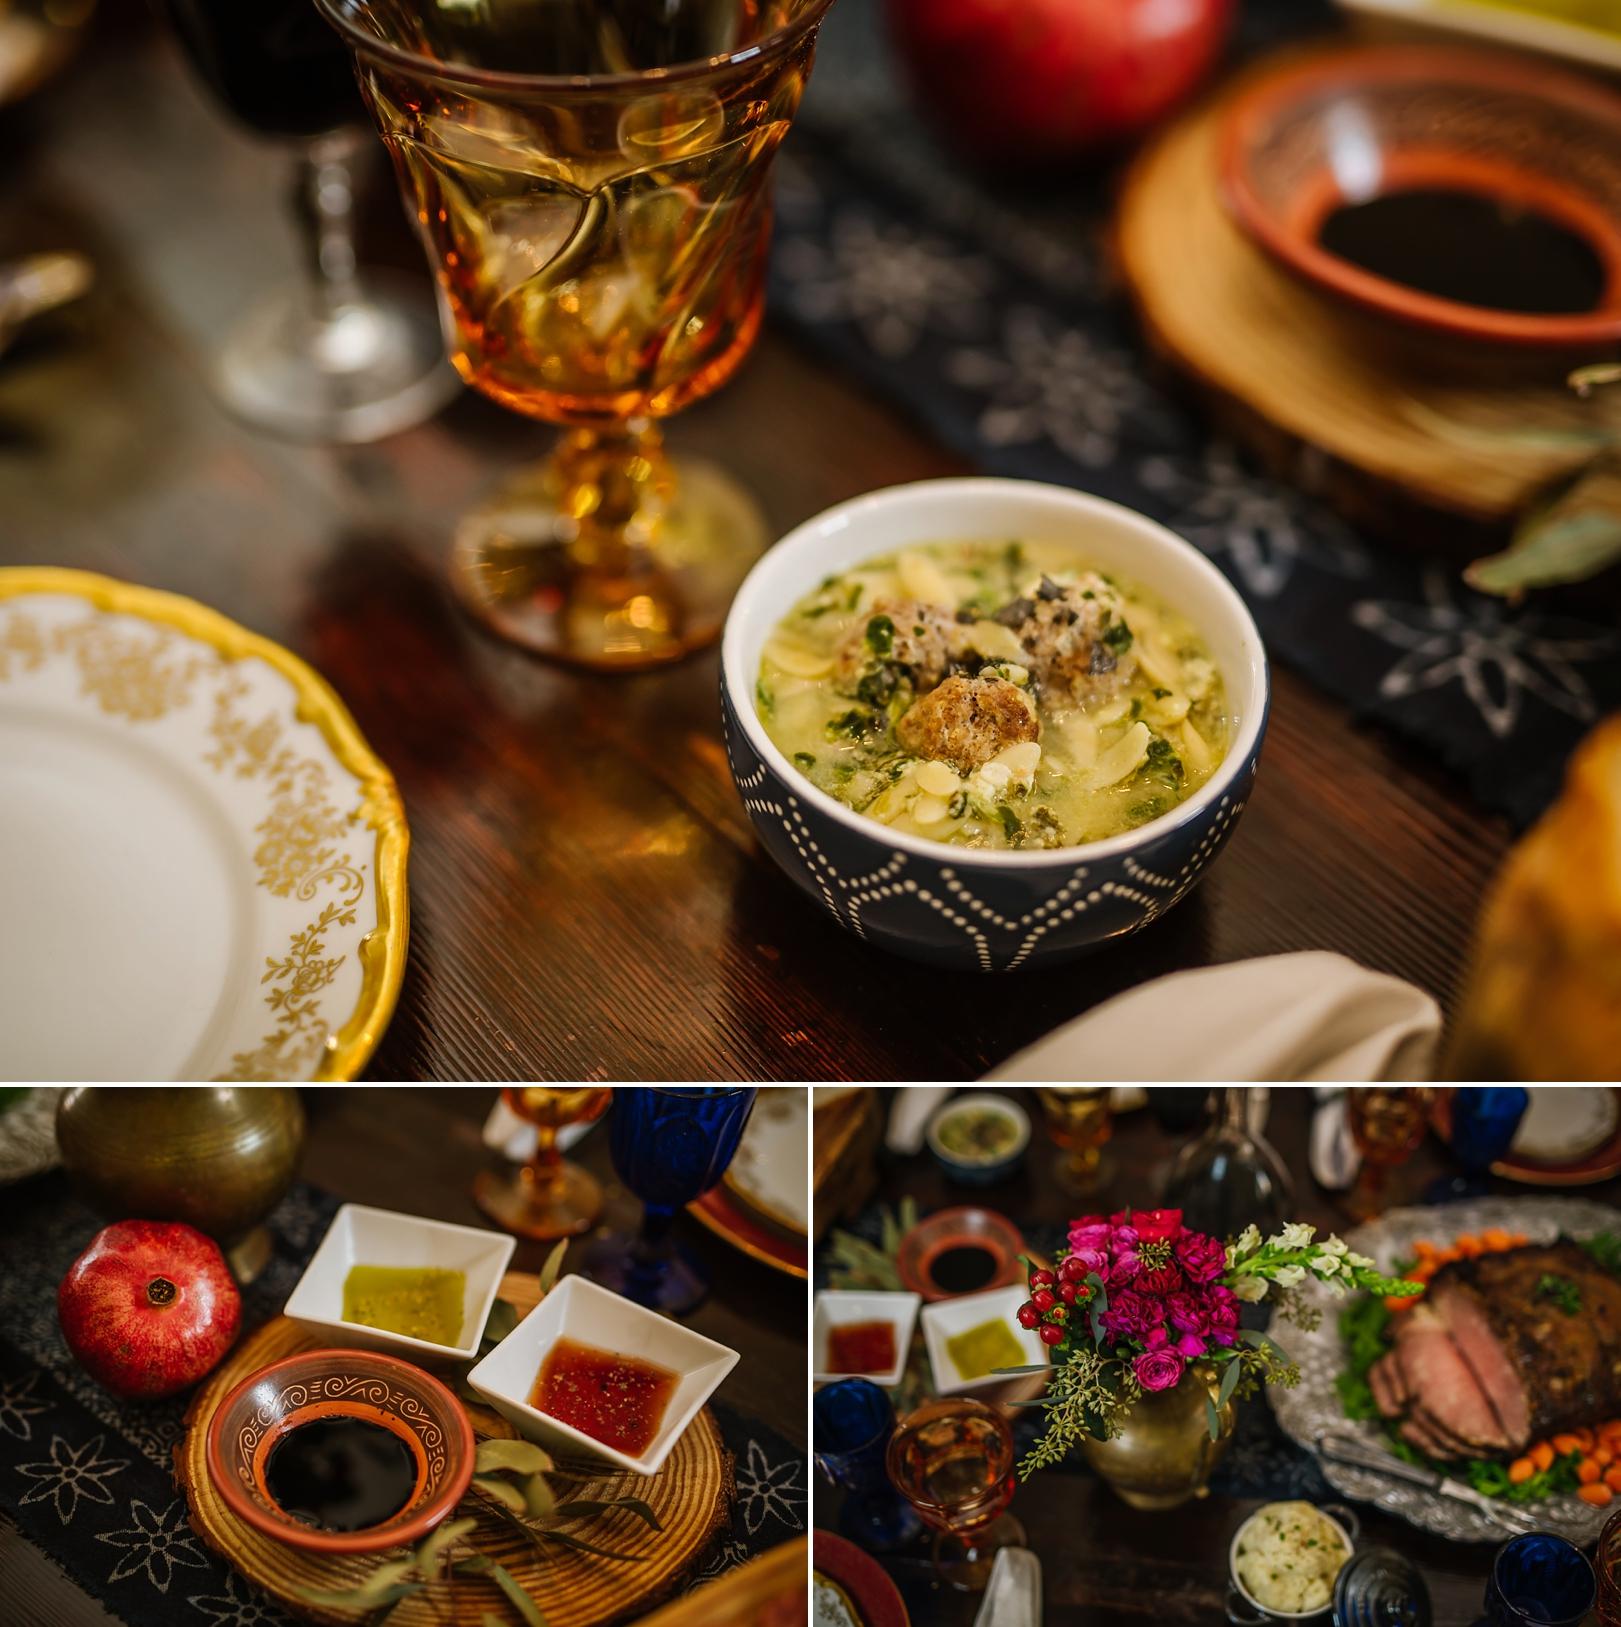 tampa-creative-commercial-food-photographer-ashlee-hamon_0004.jpg